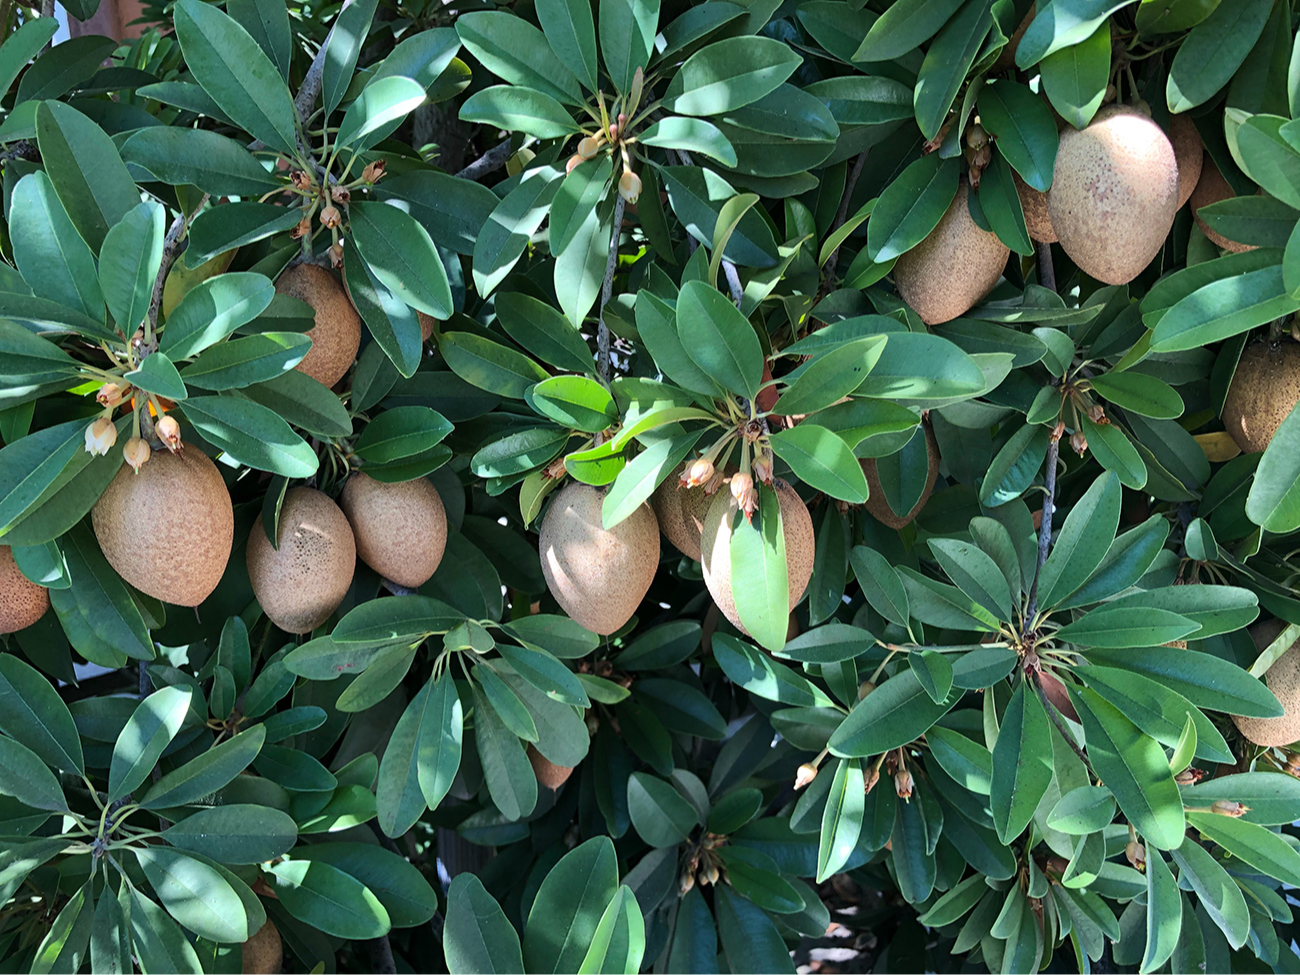 По легенде, Шива подарил дерево манго своей супруге